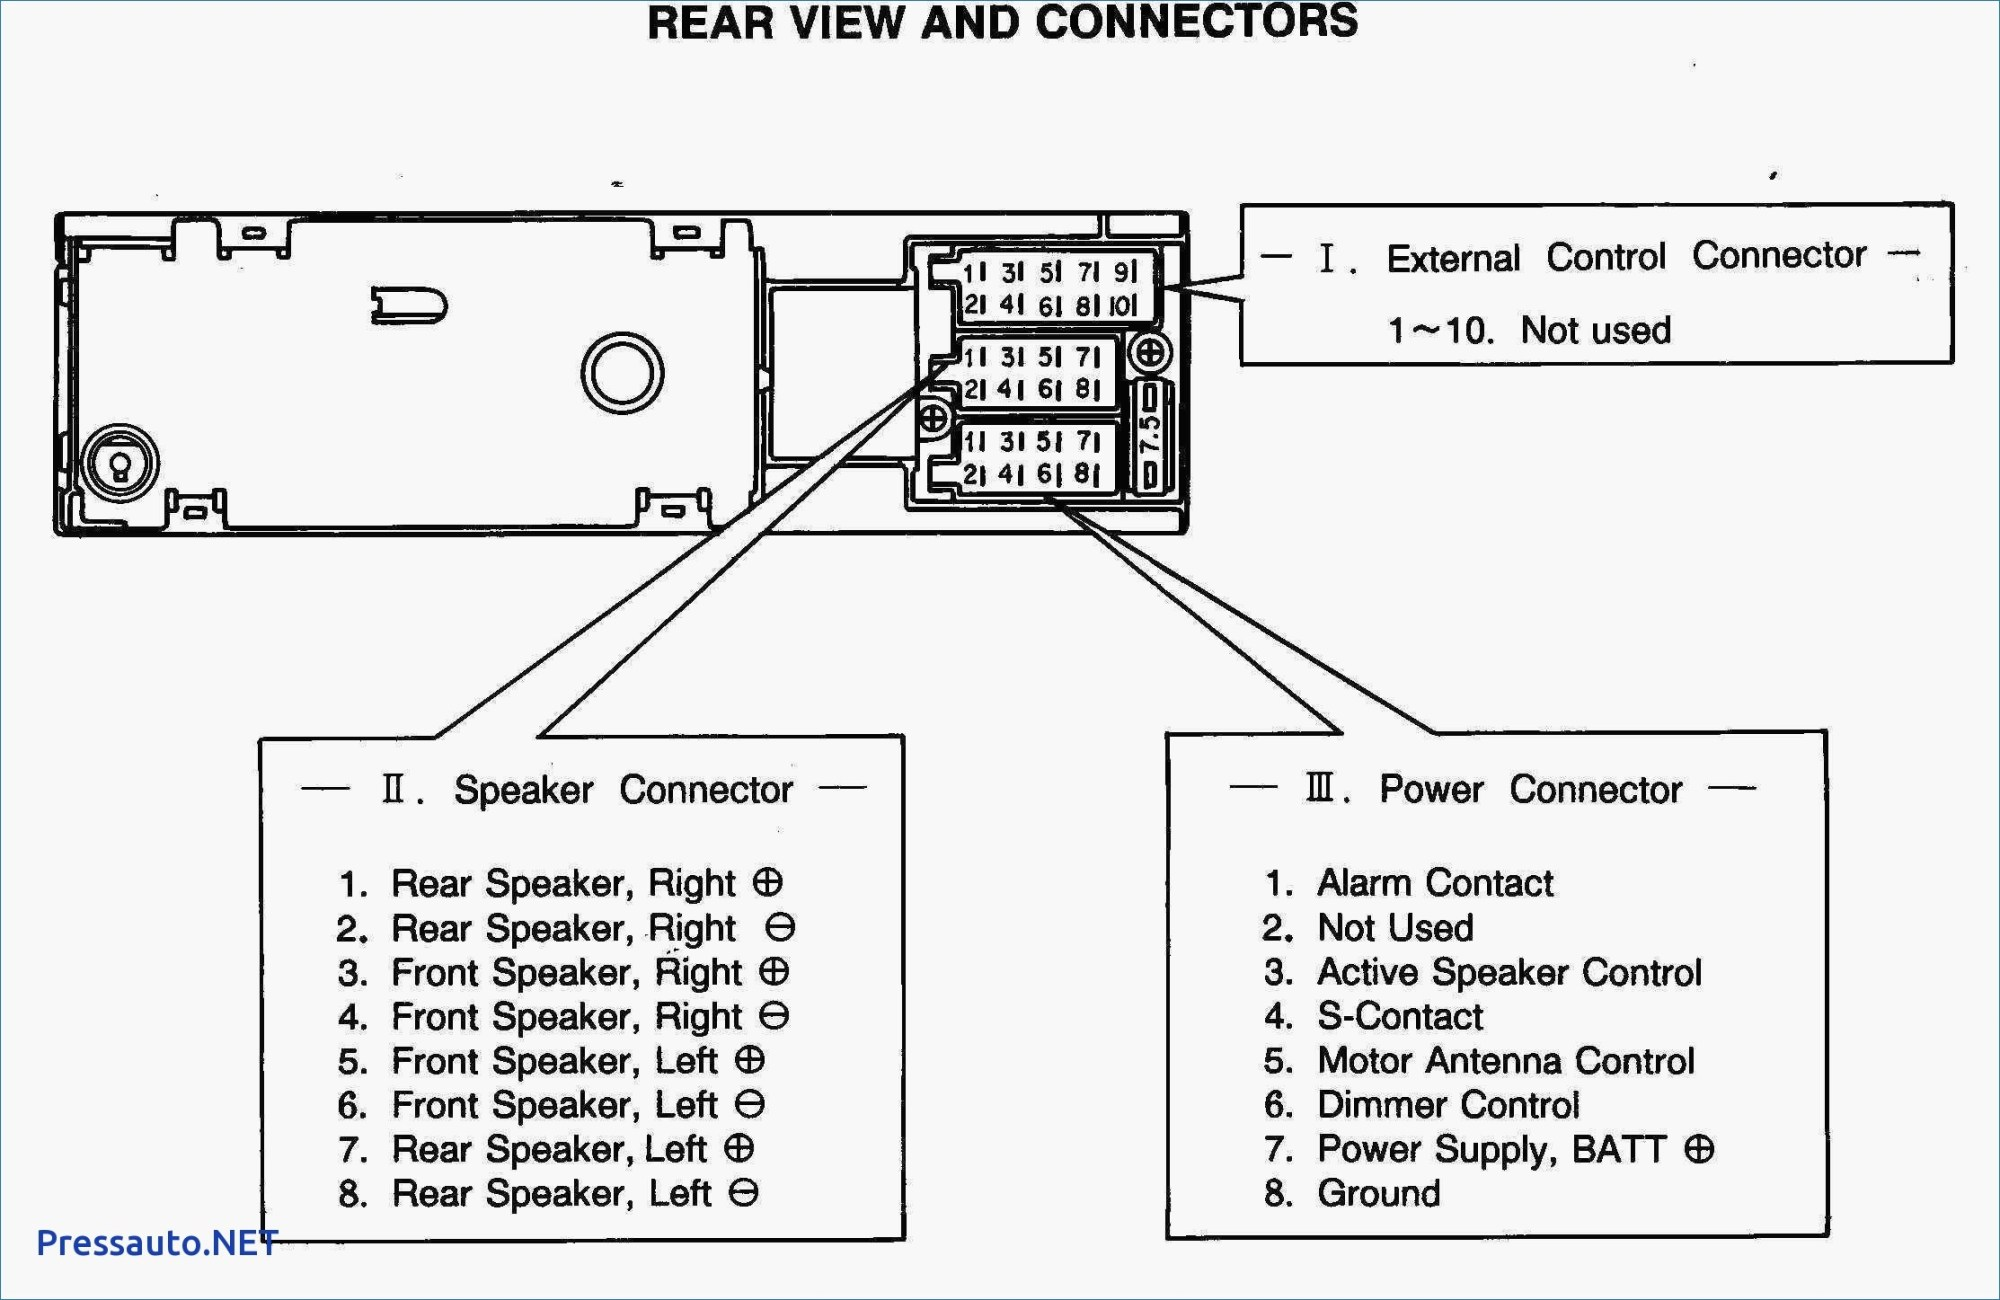 hight resolution of hyundai elantra radio wiring wiring diagram g8hyundai elantra radio wiring diagram free wiring diagram 2012 hyundai